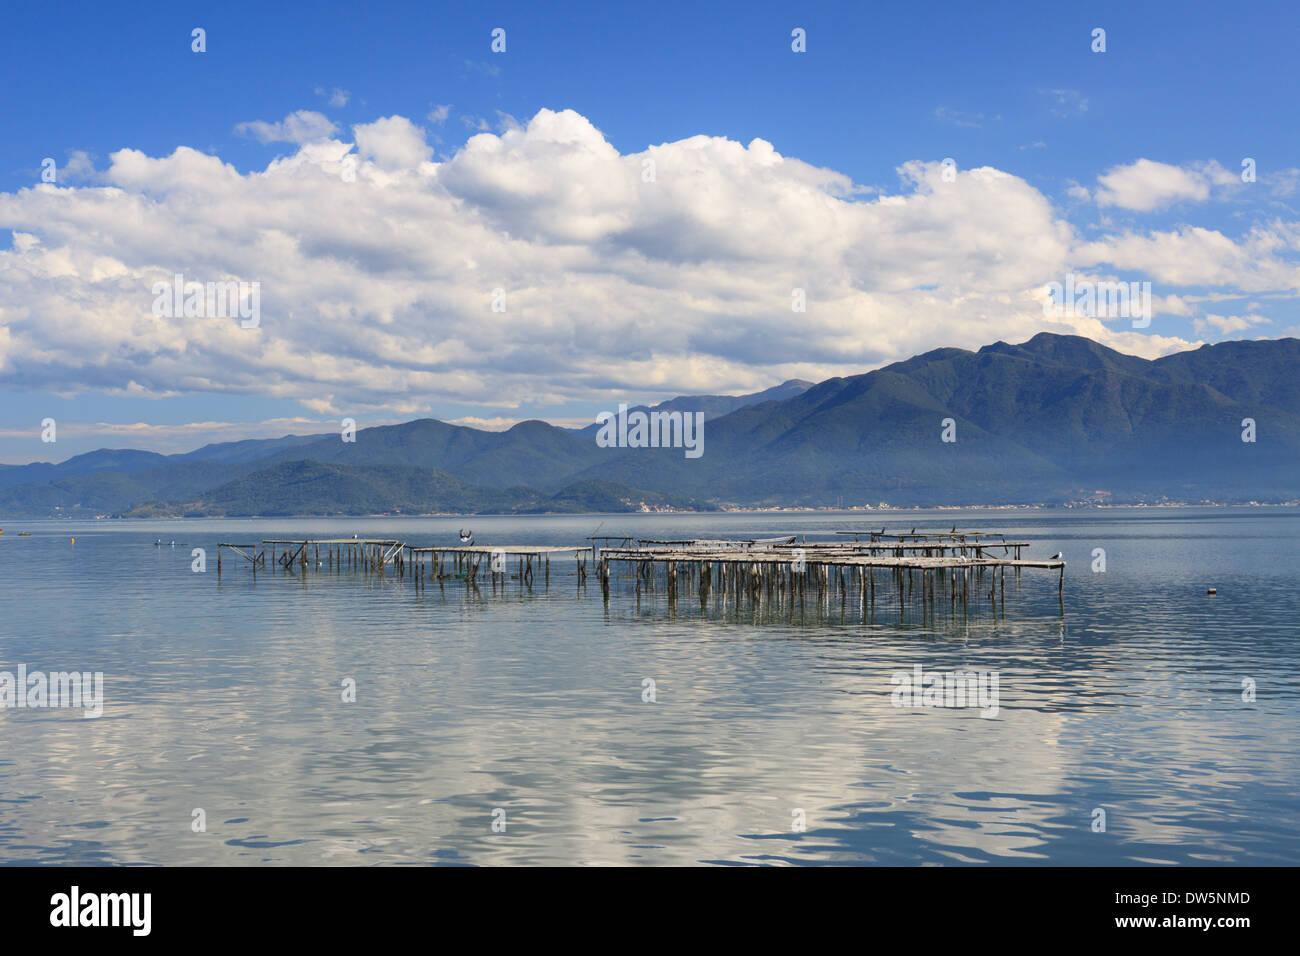 This photo was taken at Florianópolis, Santa Catarina, Brazil - Stock Image